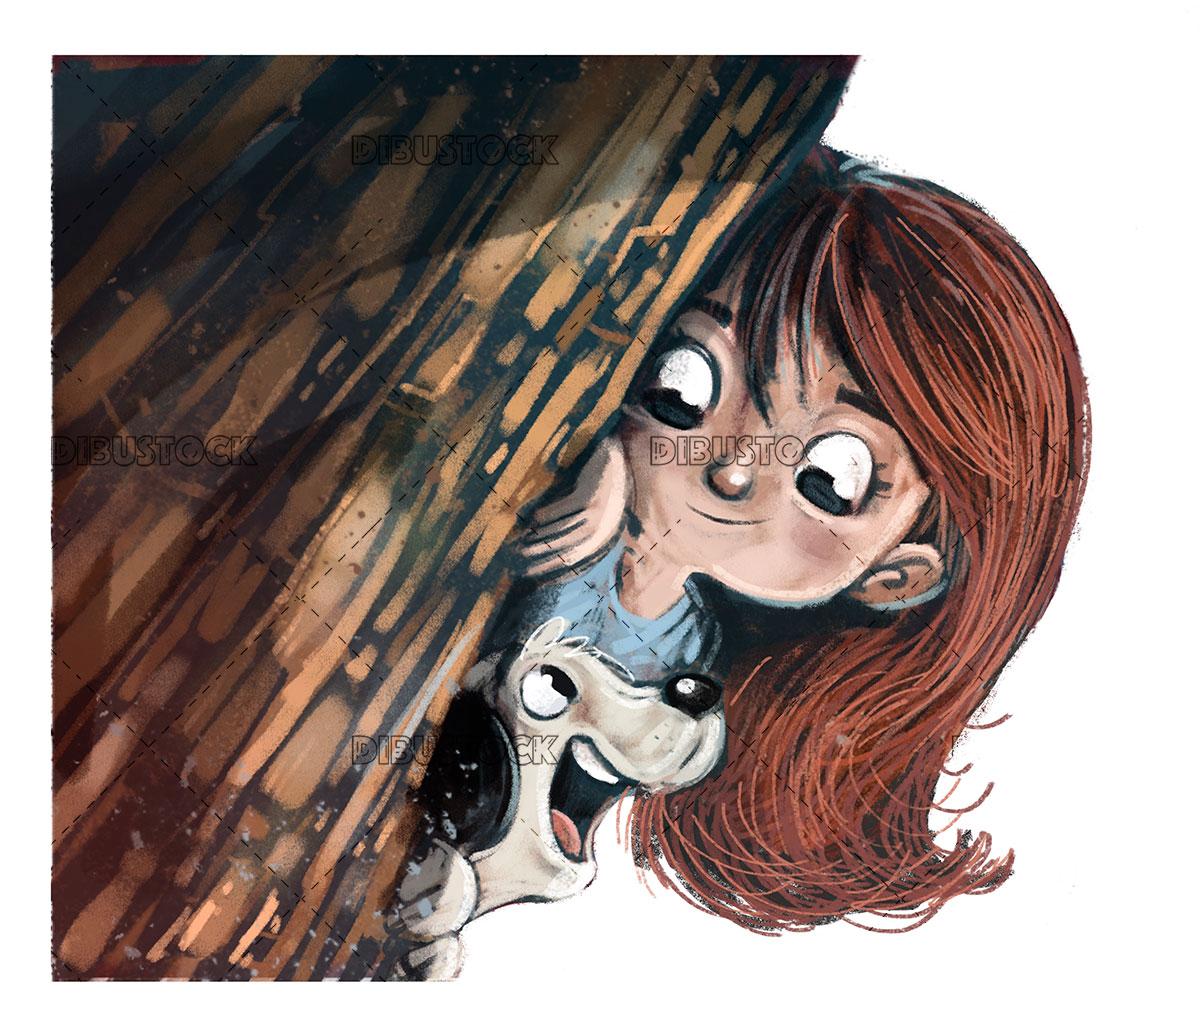 Dog and girl hidden behind a tree